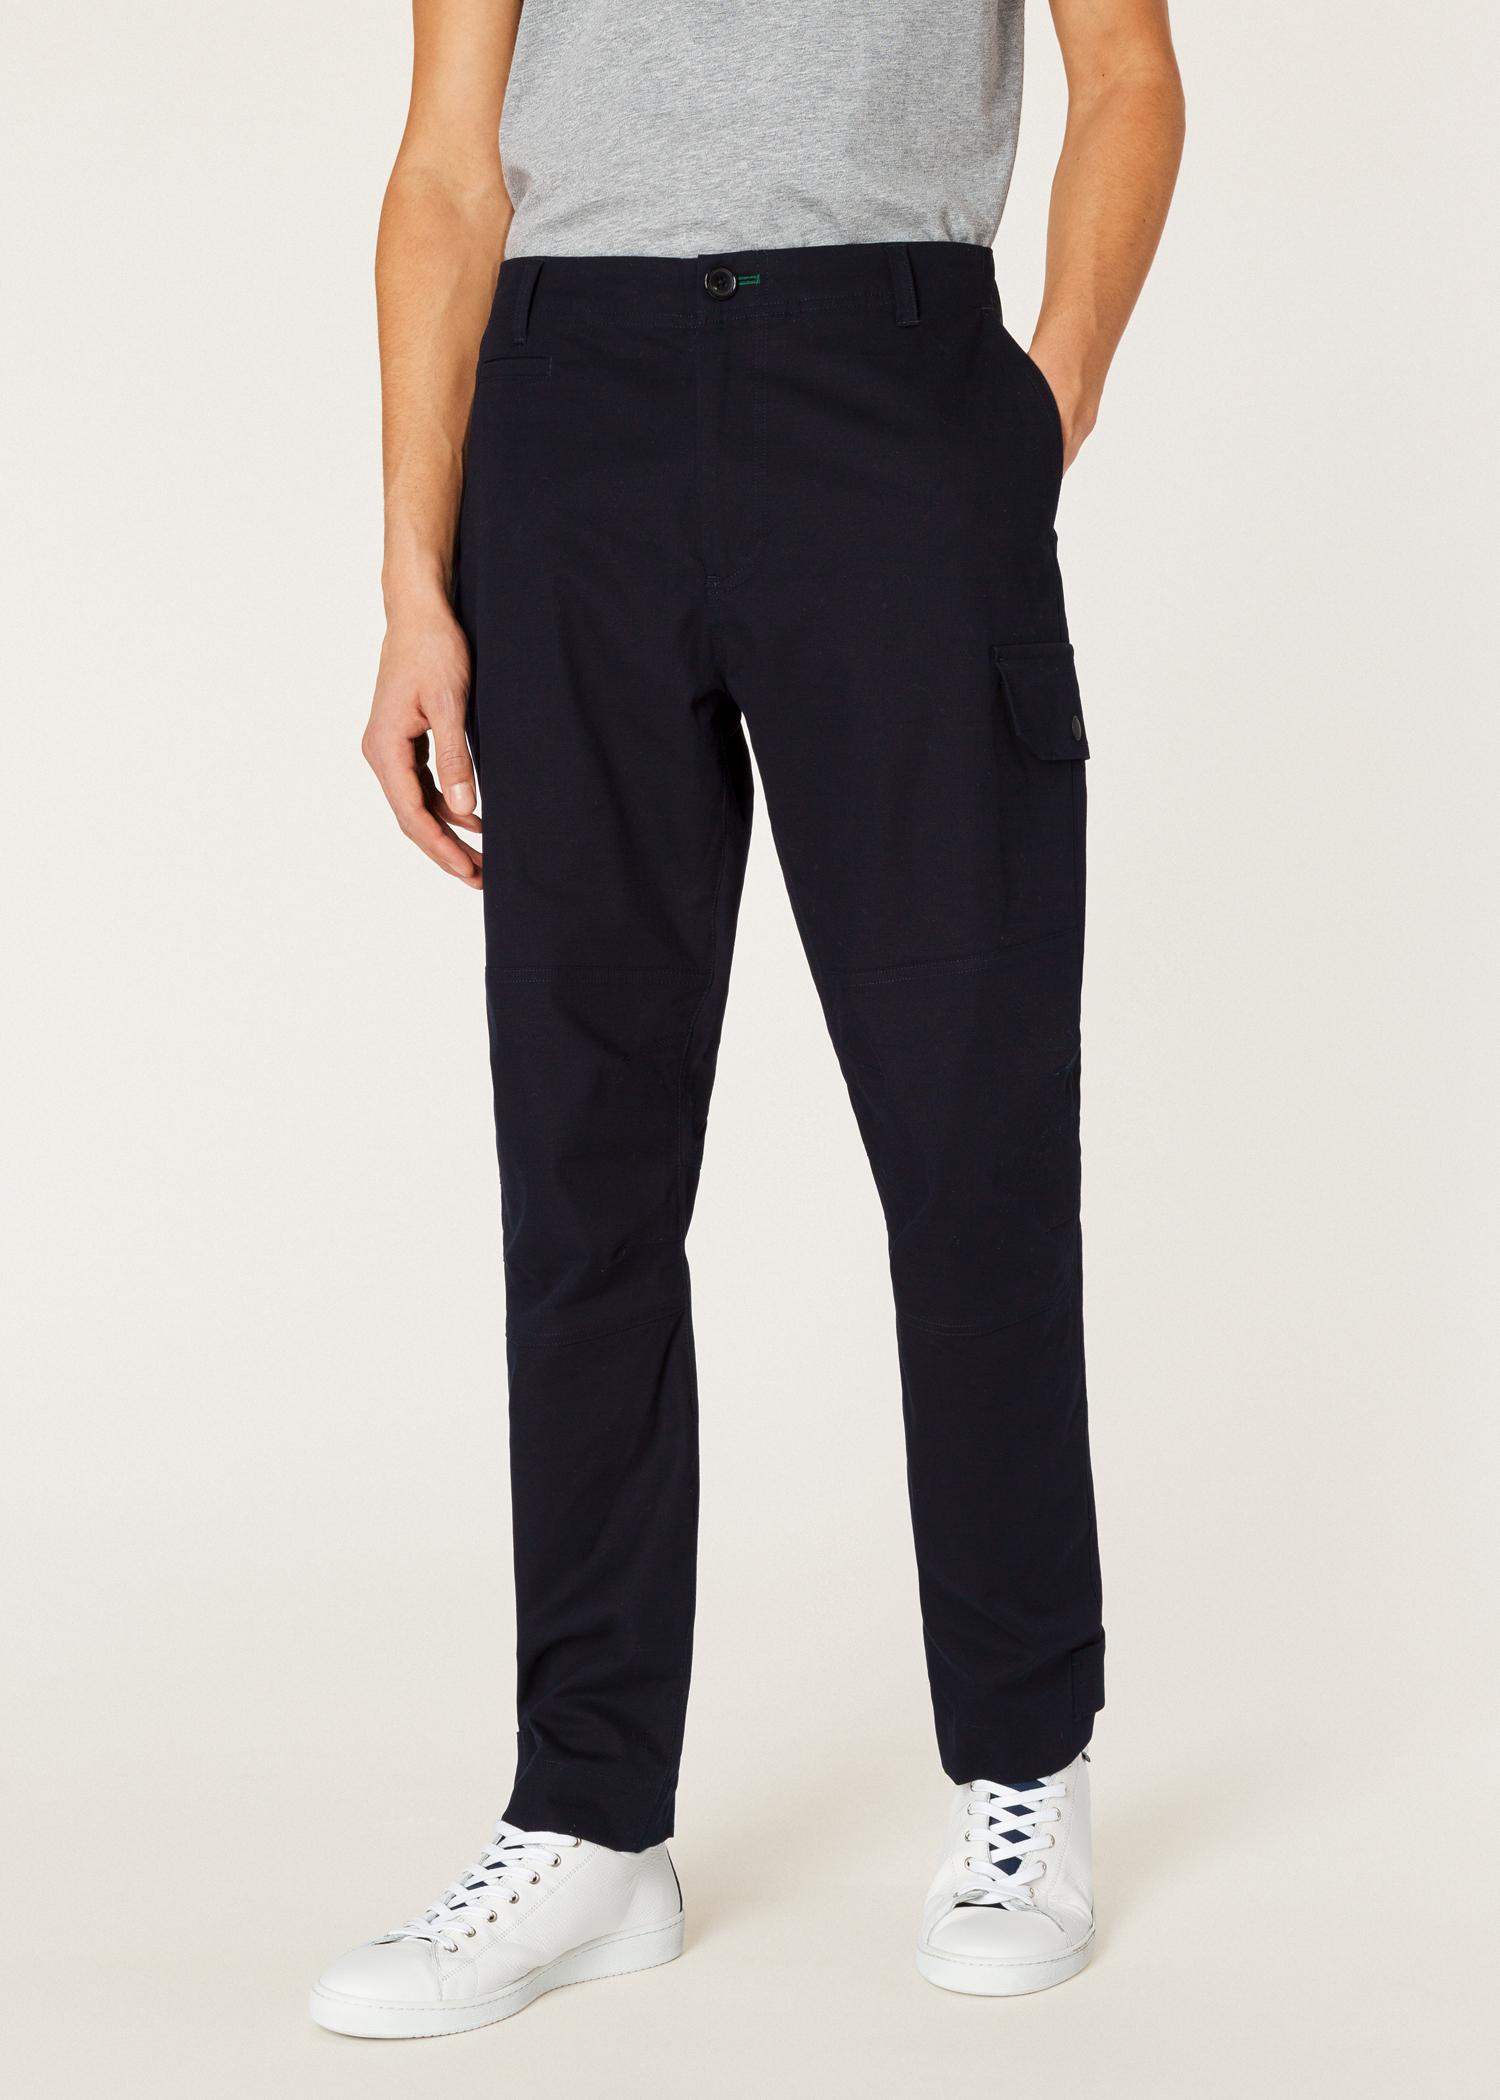 e6c19d7a3 Men s Dark Navy Garment-Dyed Stretch-Cotton Cargo Trousers - Paul ...